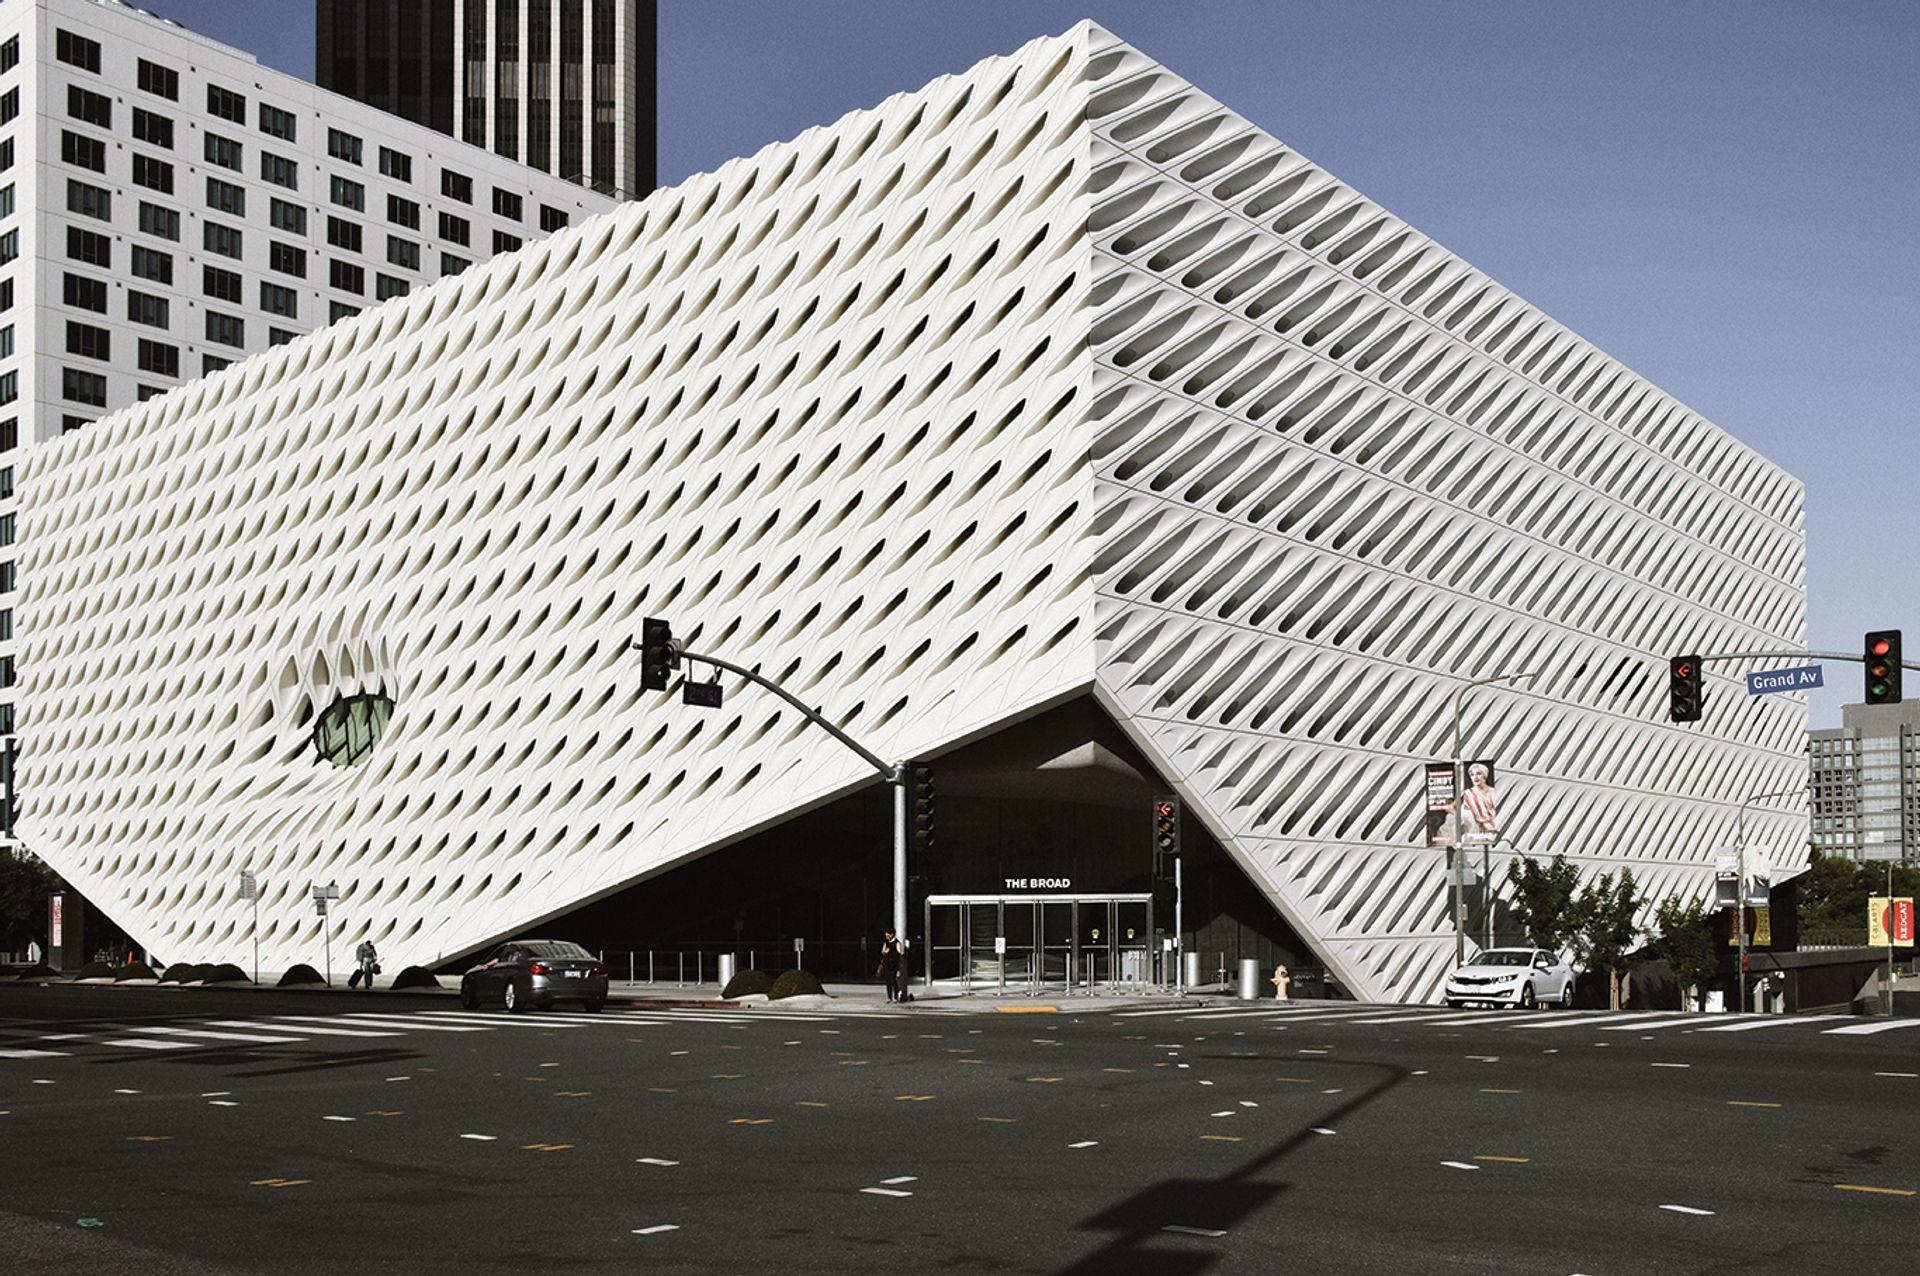 The Broad Museum in Los Angeles Photo by Tu Tram Pham on Unsplash